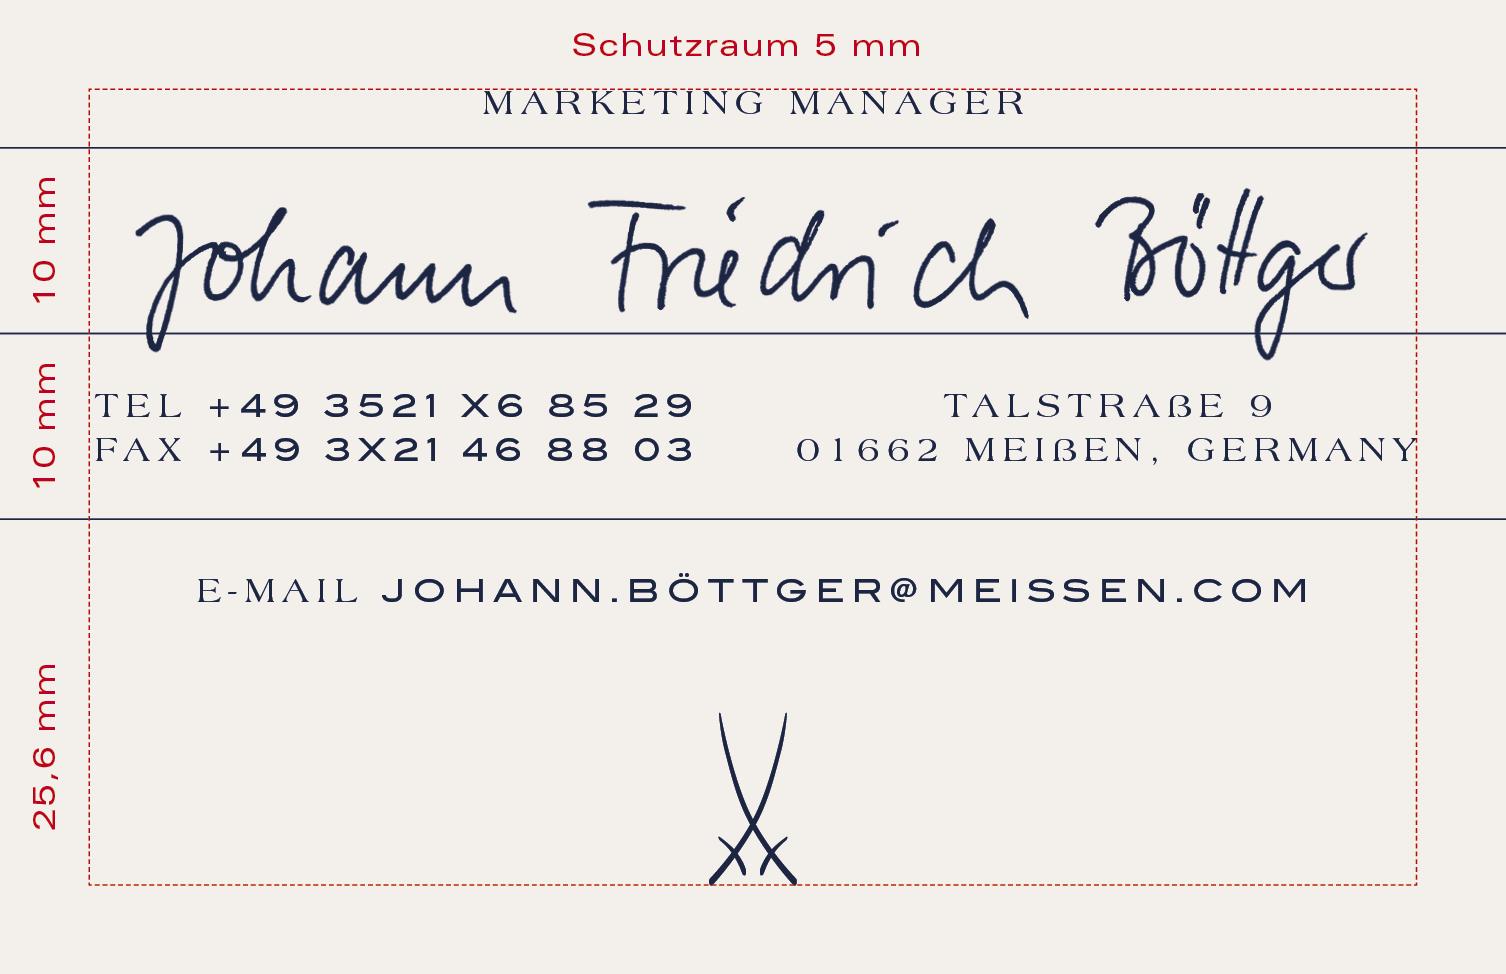 visitenkarten-schutzraum-1905295